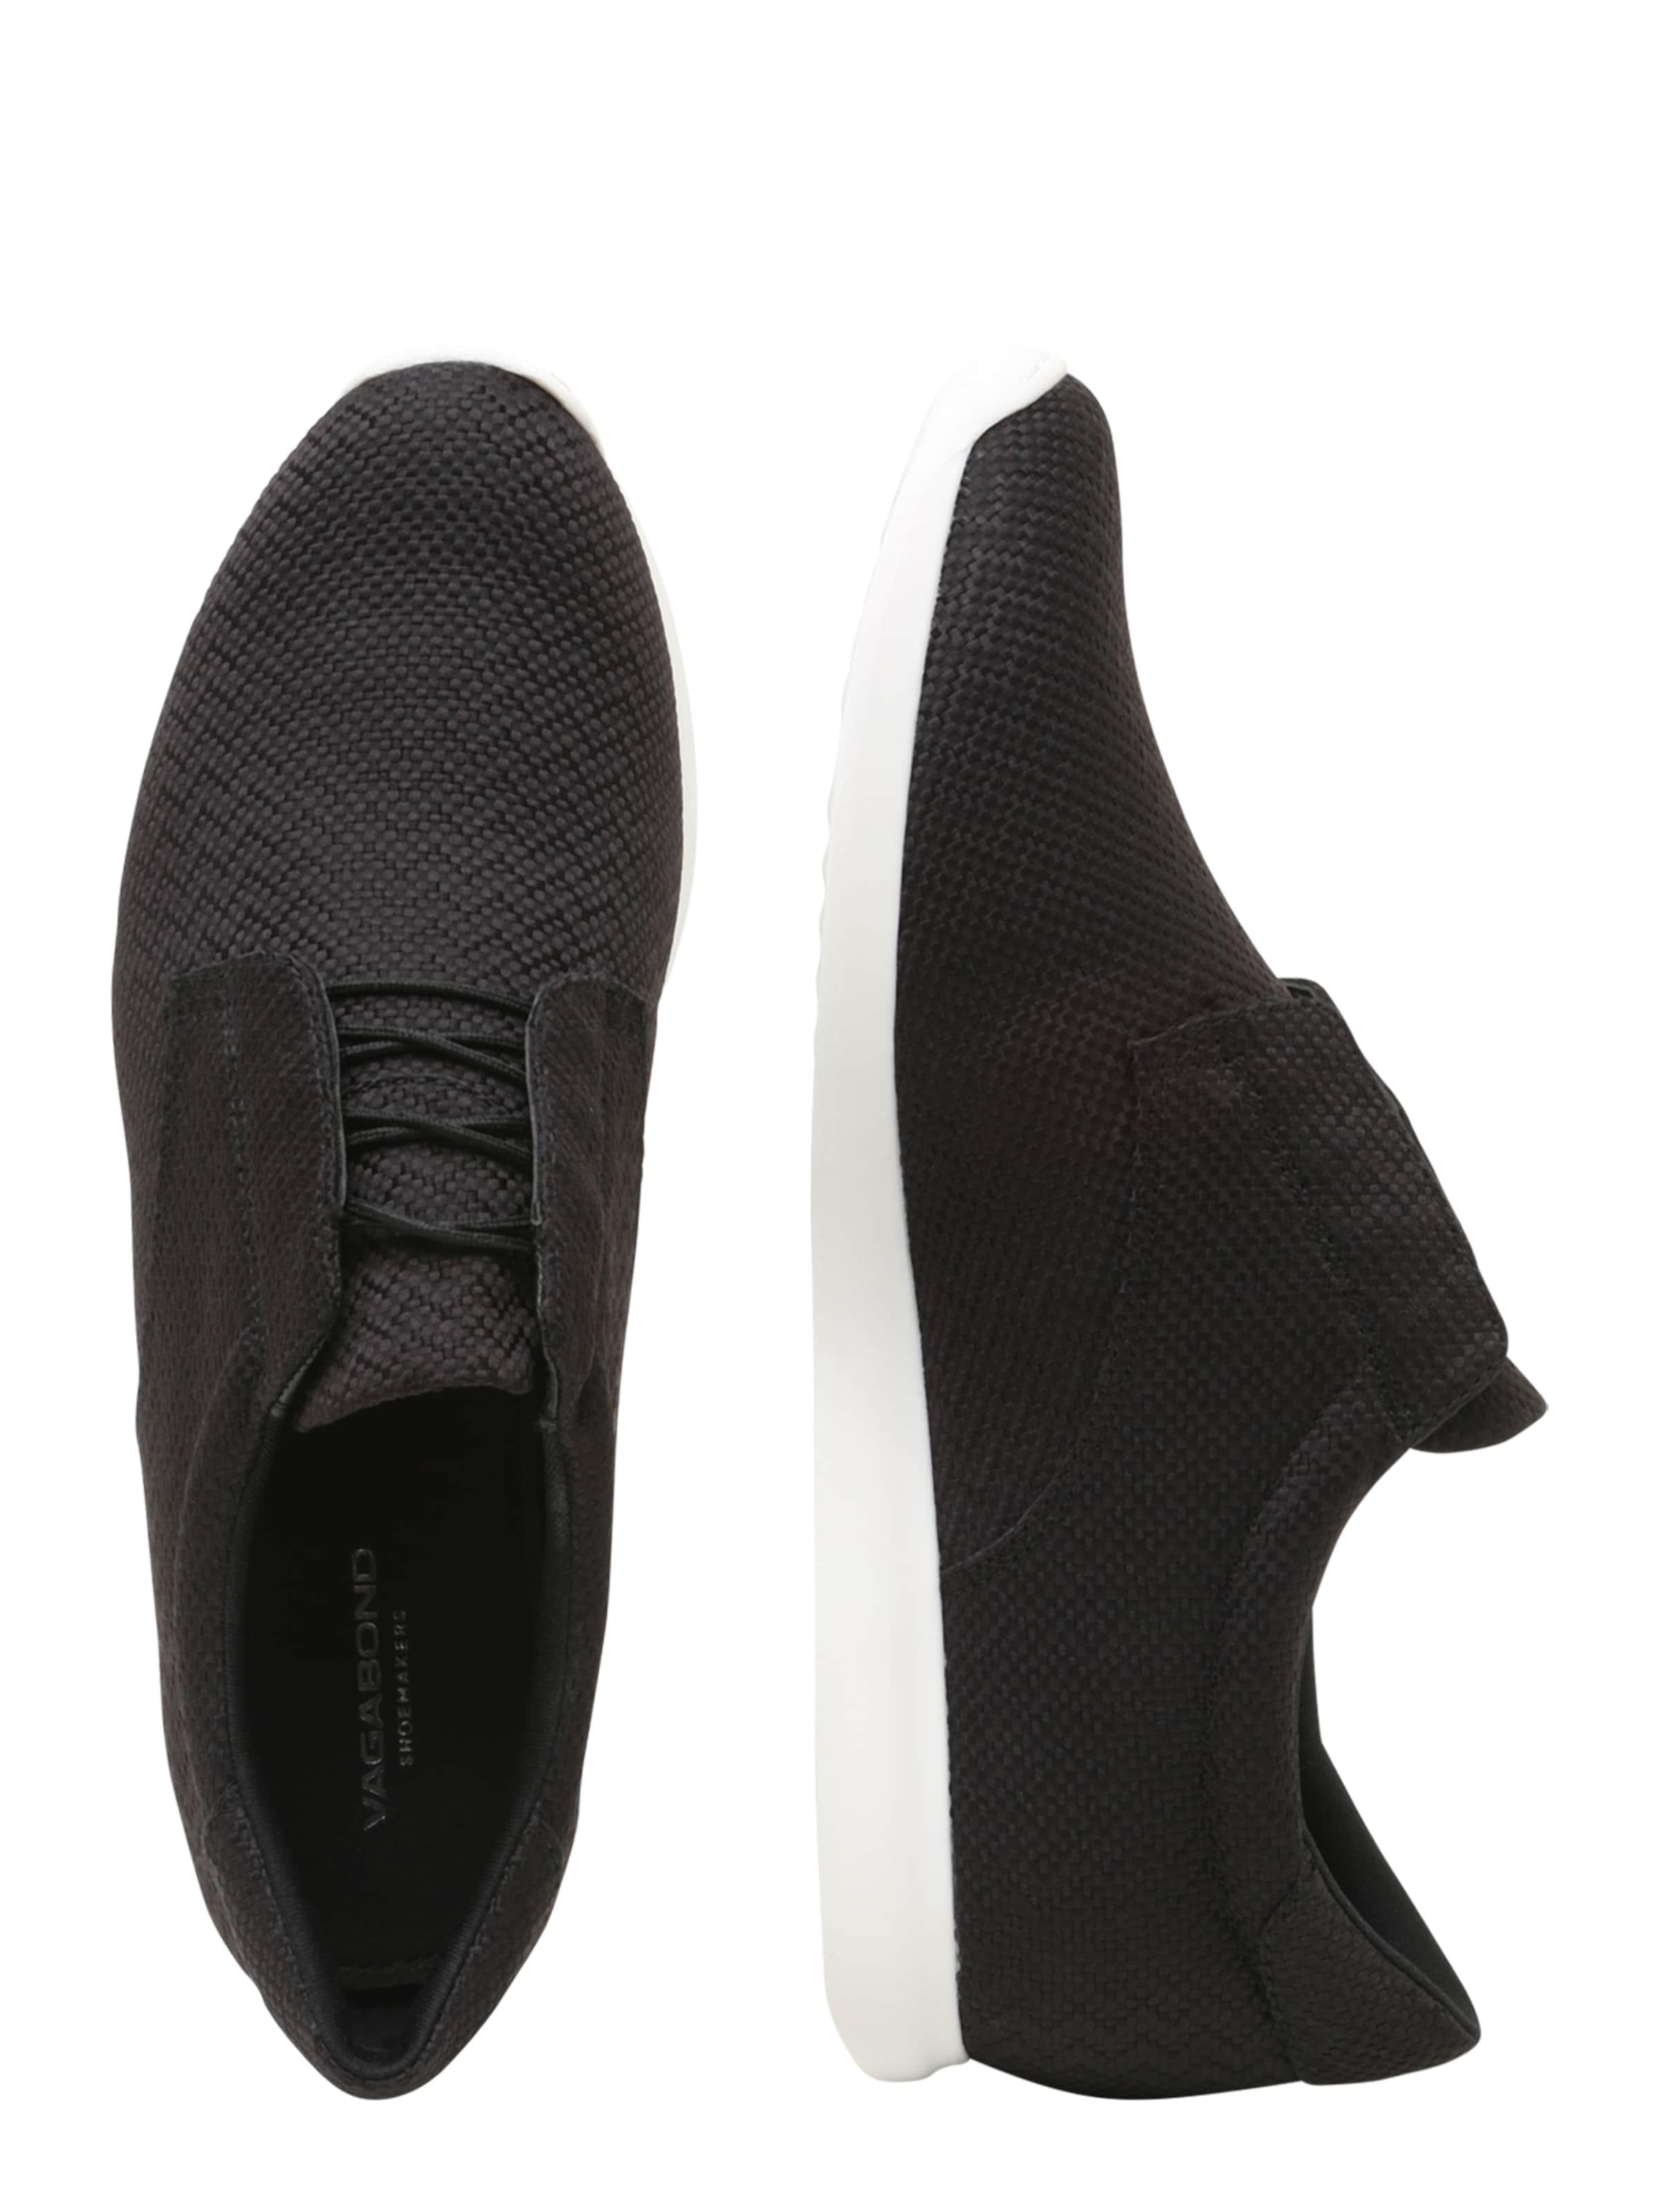 Schwarz Shoemakers Sneaker 0' Vagabond 'kasai 2 In doCxBe